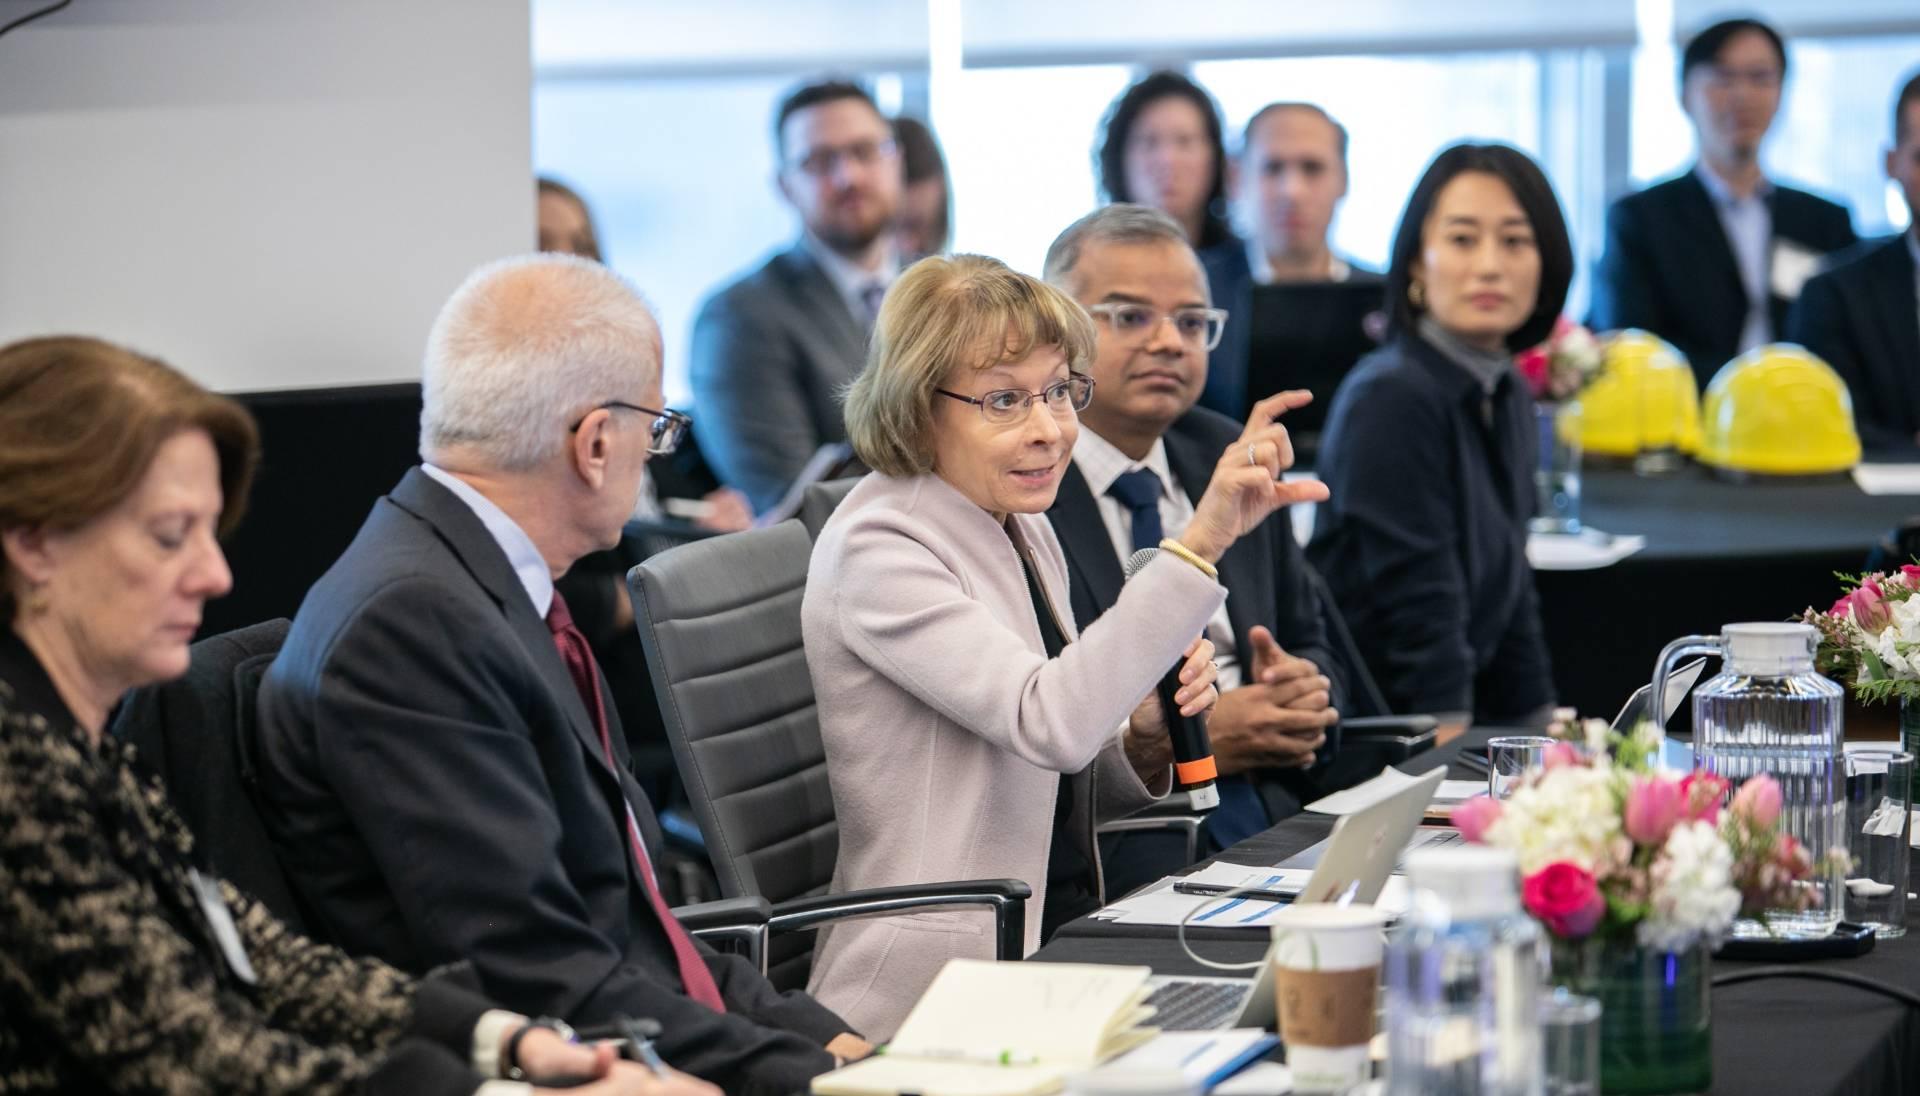 Nancy McKinstry at the Global Innovation Awards 2019